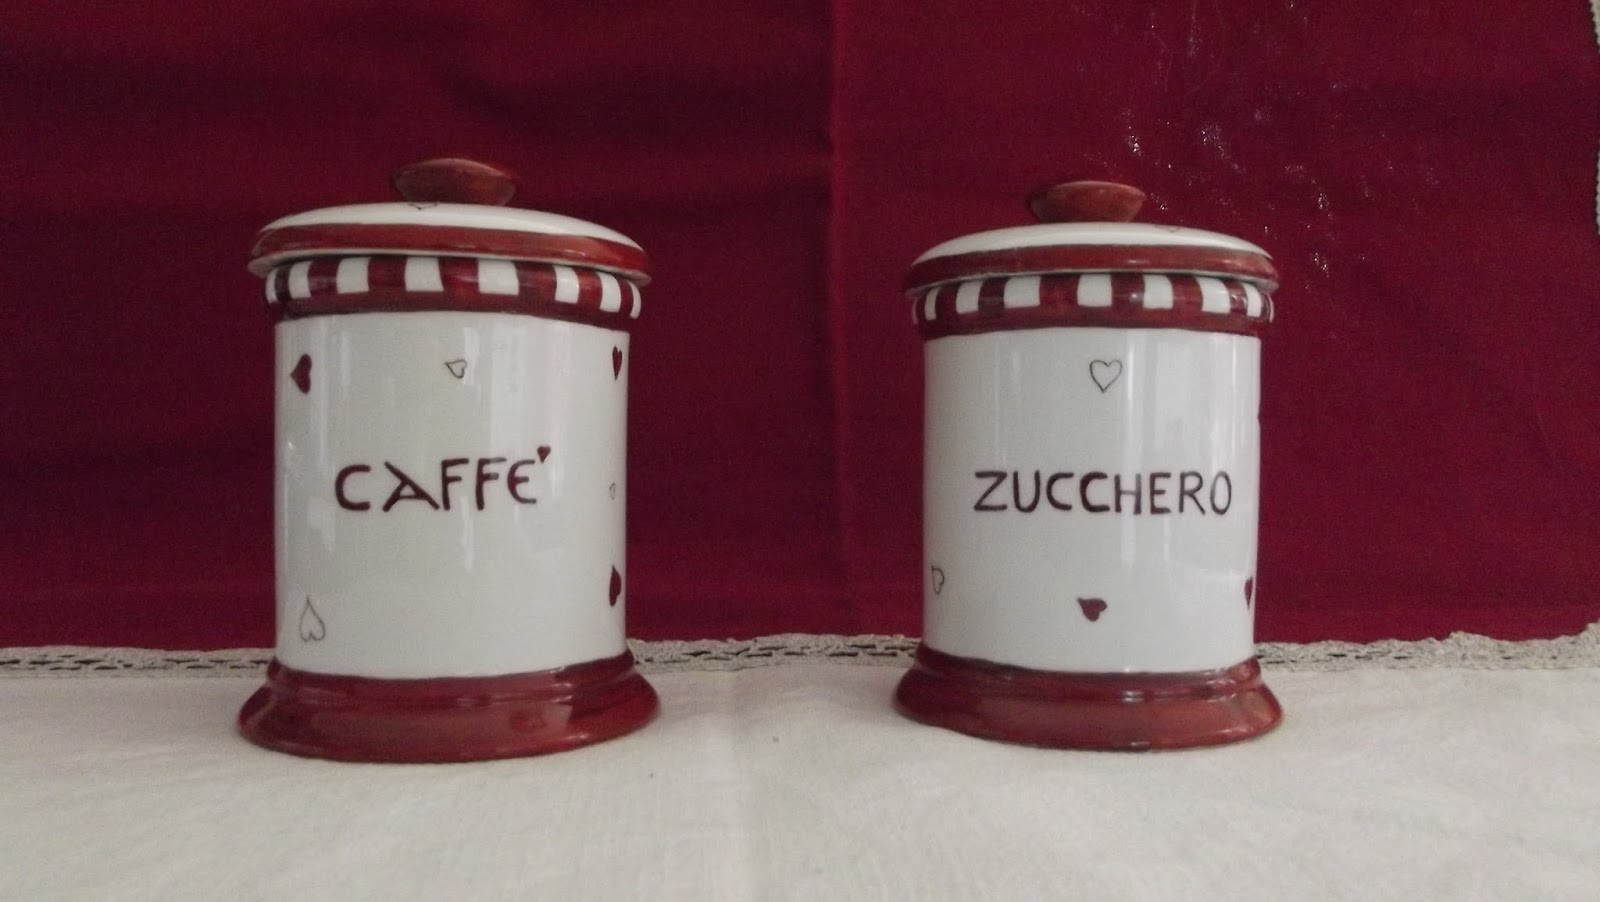 Pittura su ceramica di roberta zanin oggettistica per cucina for Oggettistica cucina online